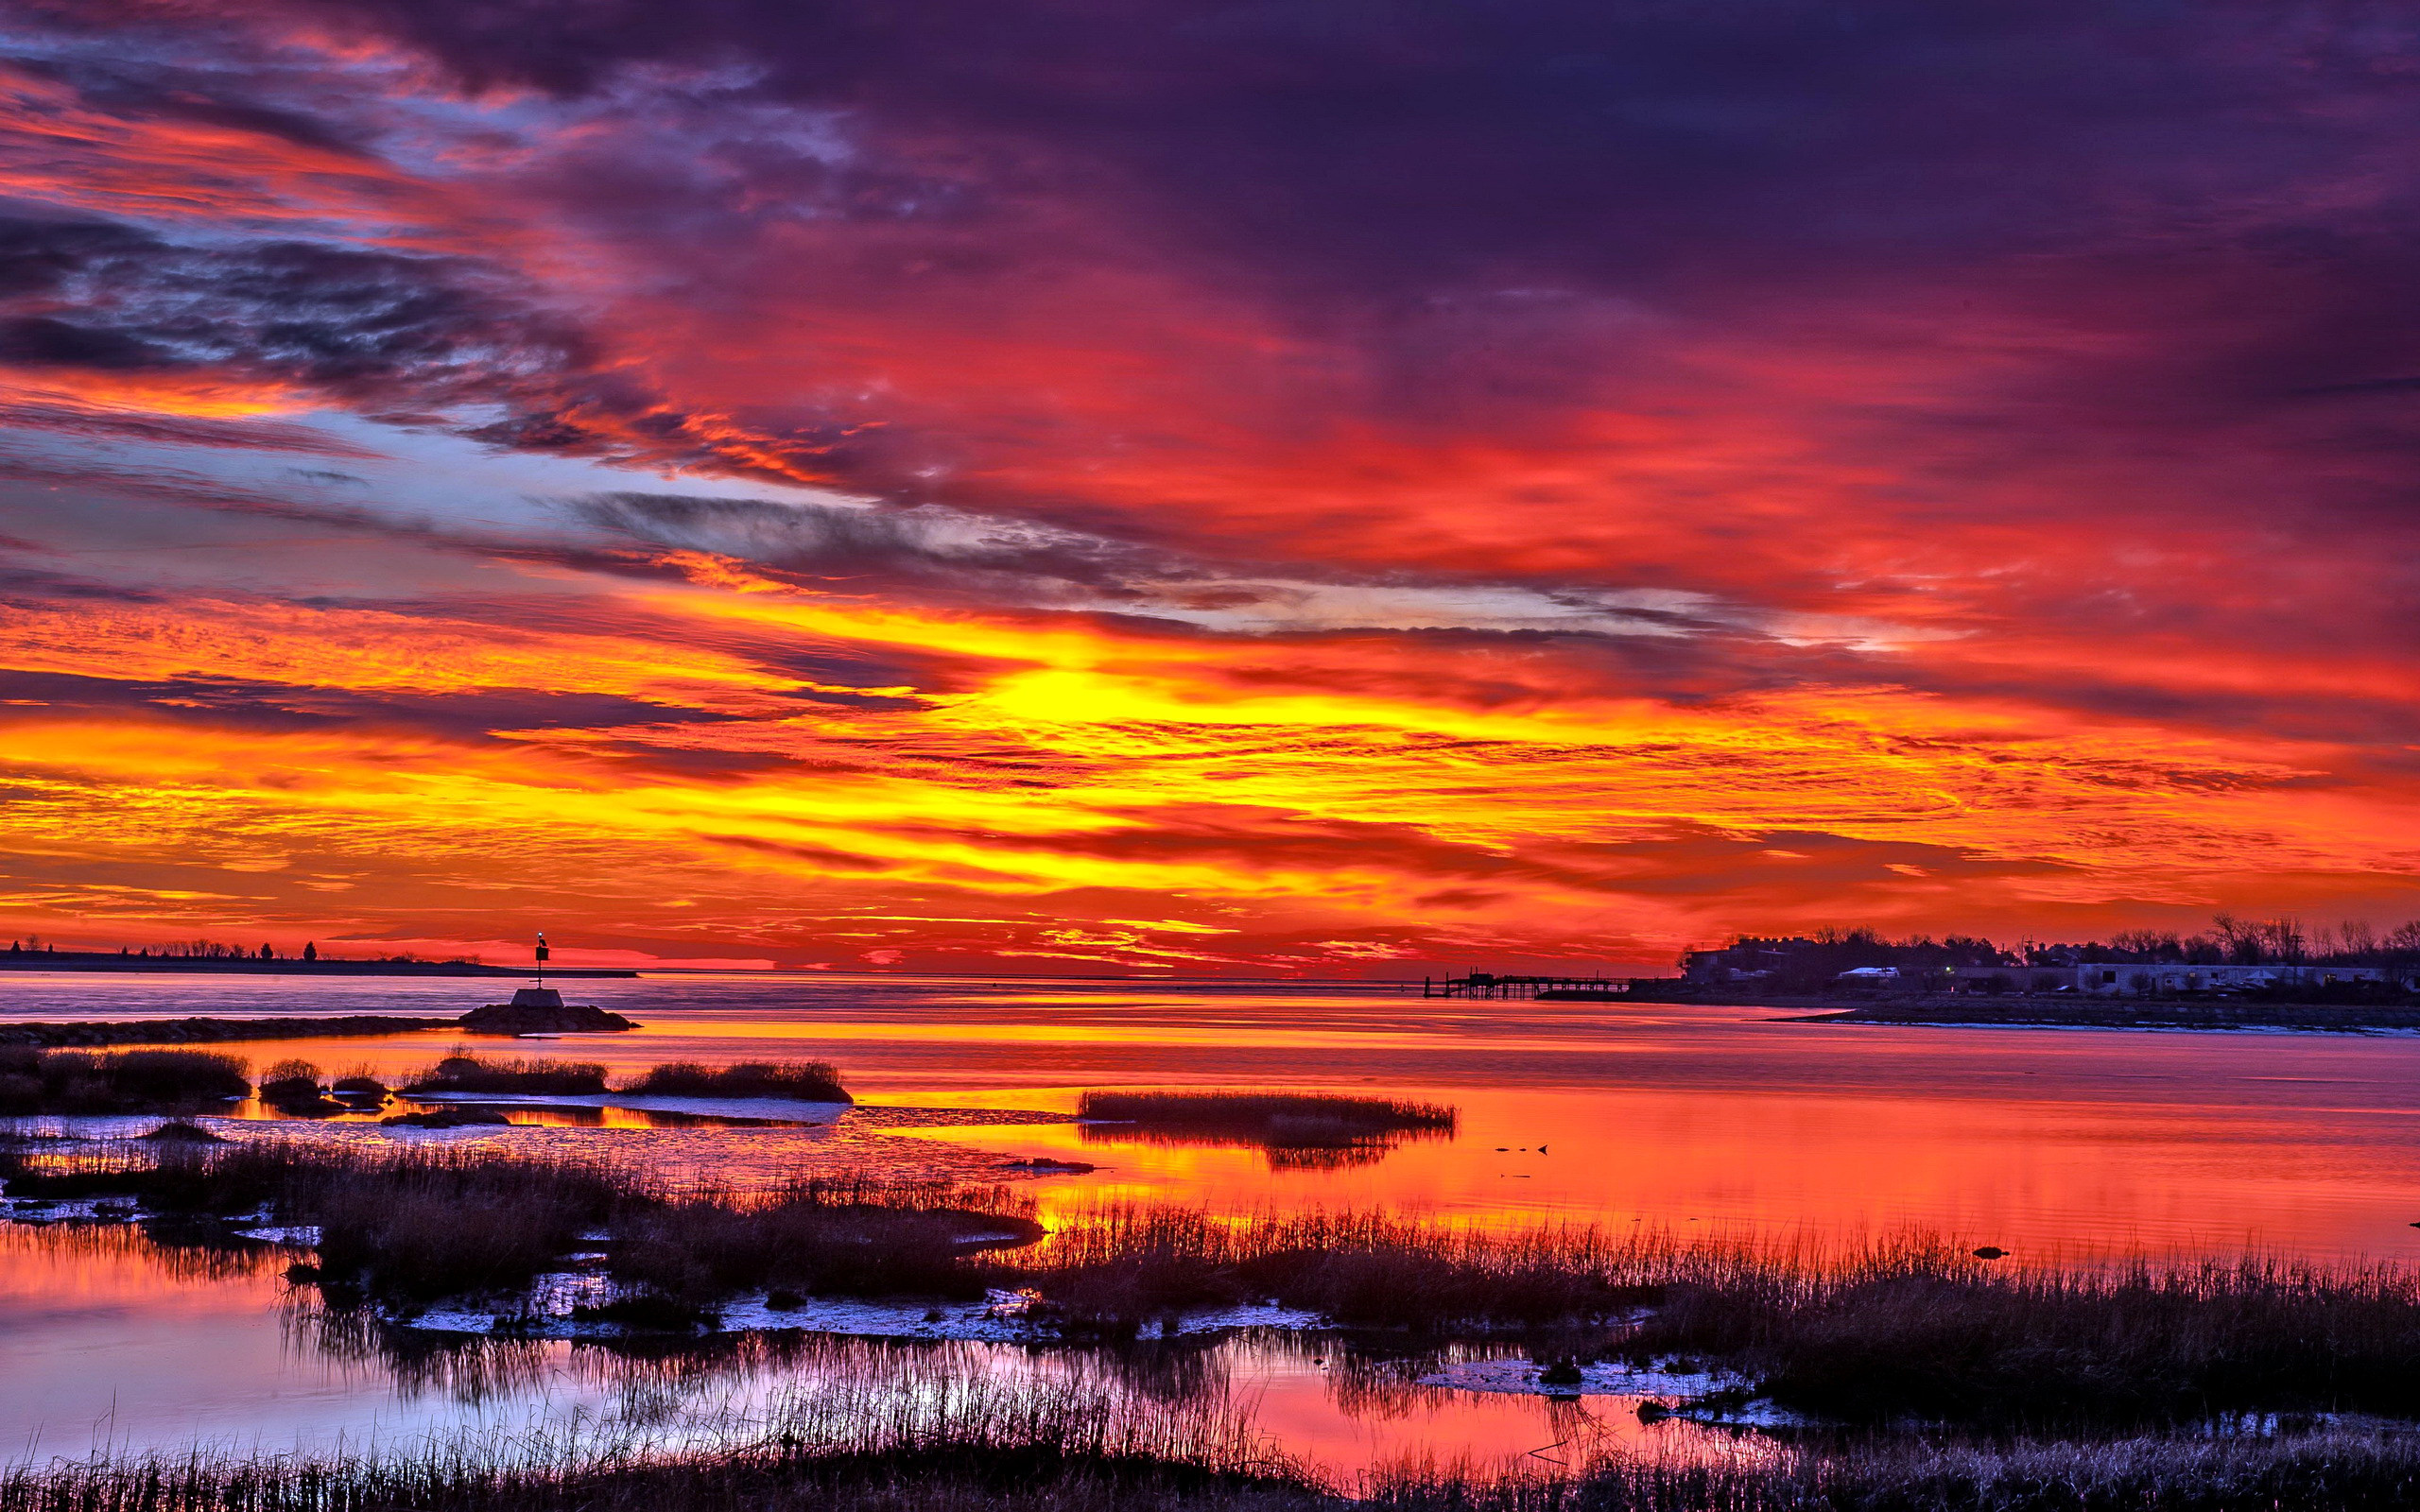 Hd Sunset Wallpaper 72 Images